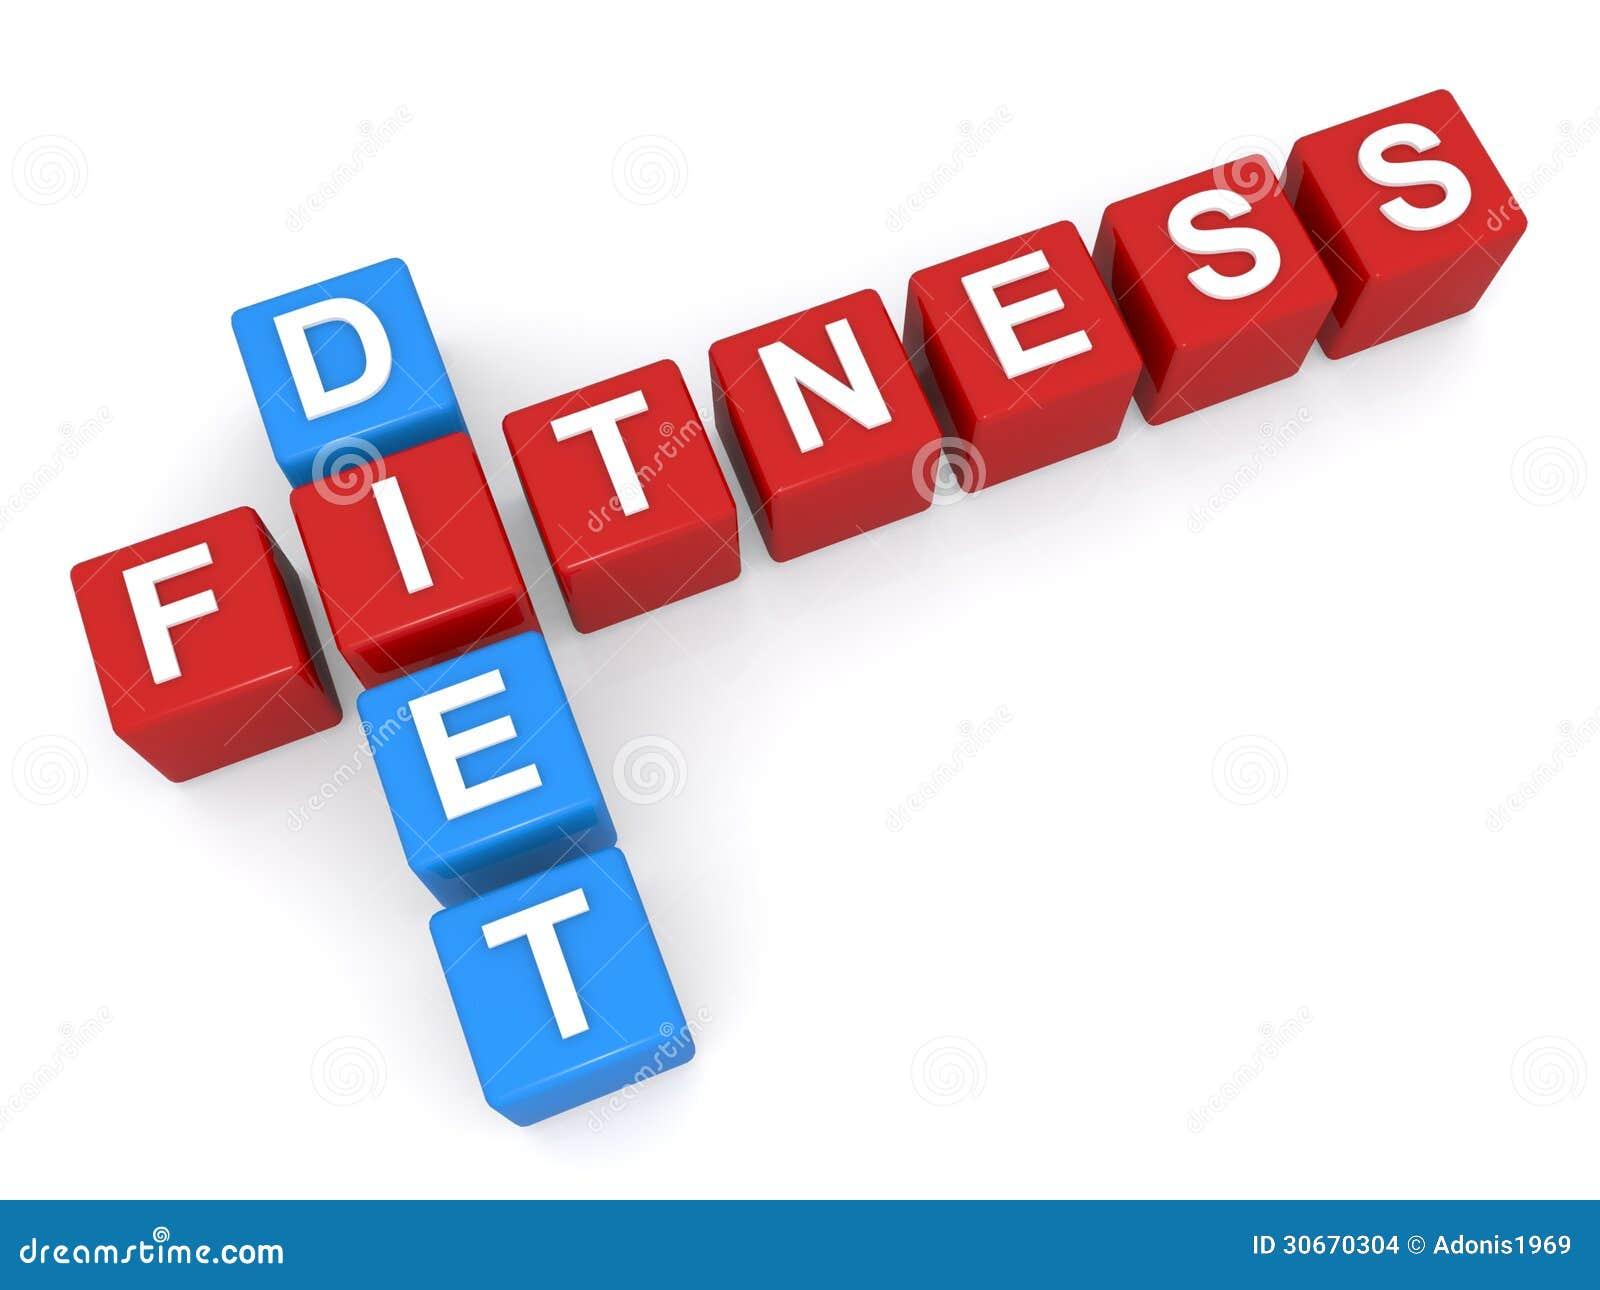 Sport training business plan